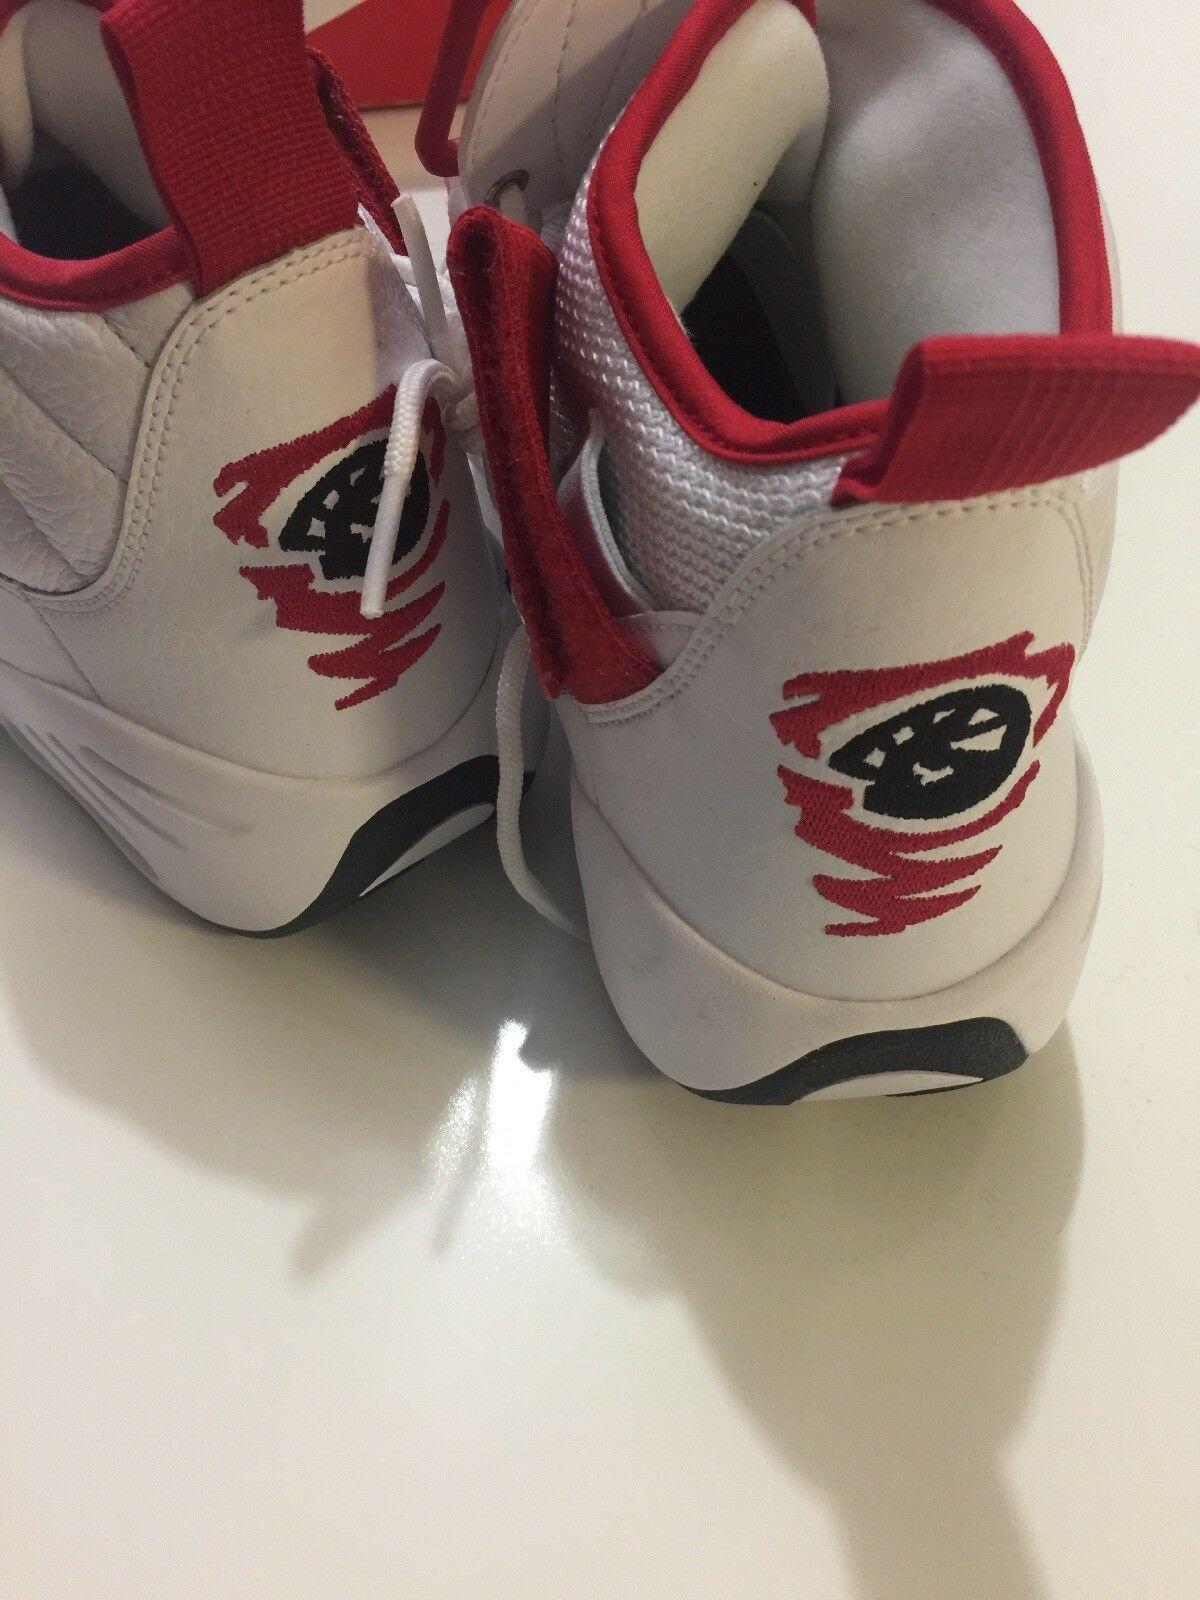 Nike Air Shake Ndestrukt Men's Basketball Shoes White/Red 880869 100 Size 11 image 8